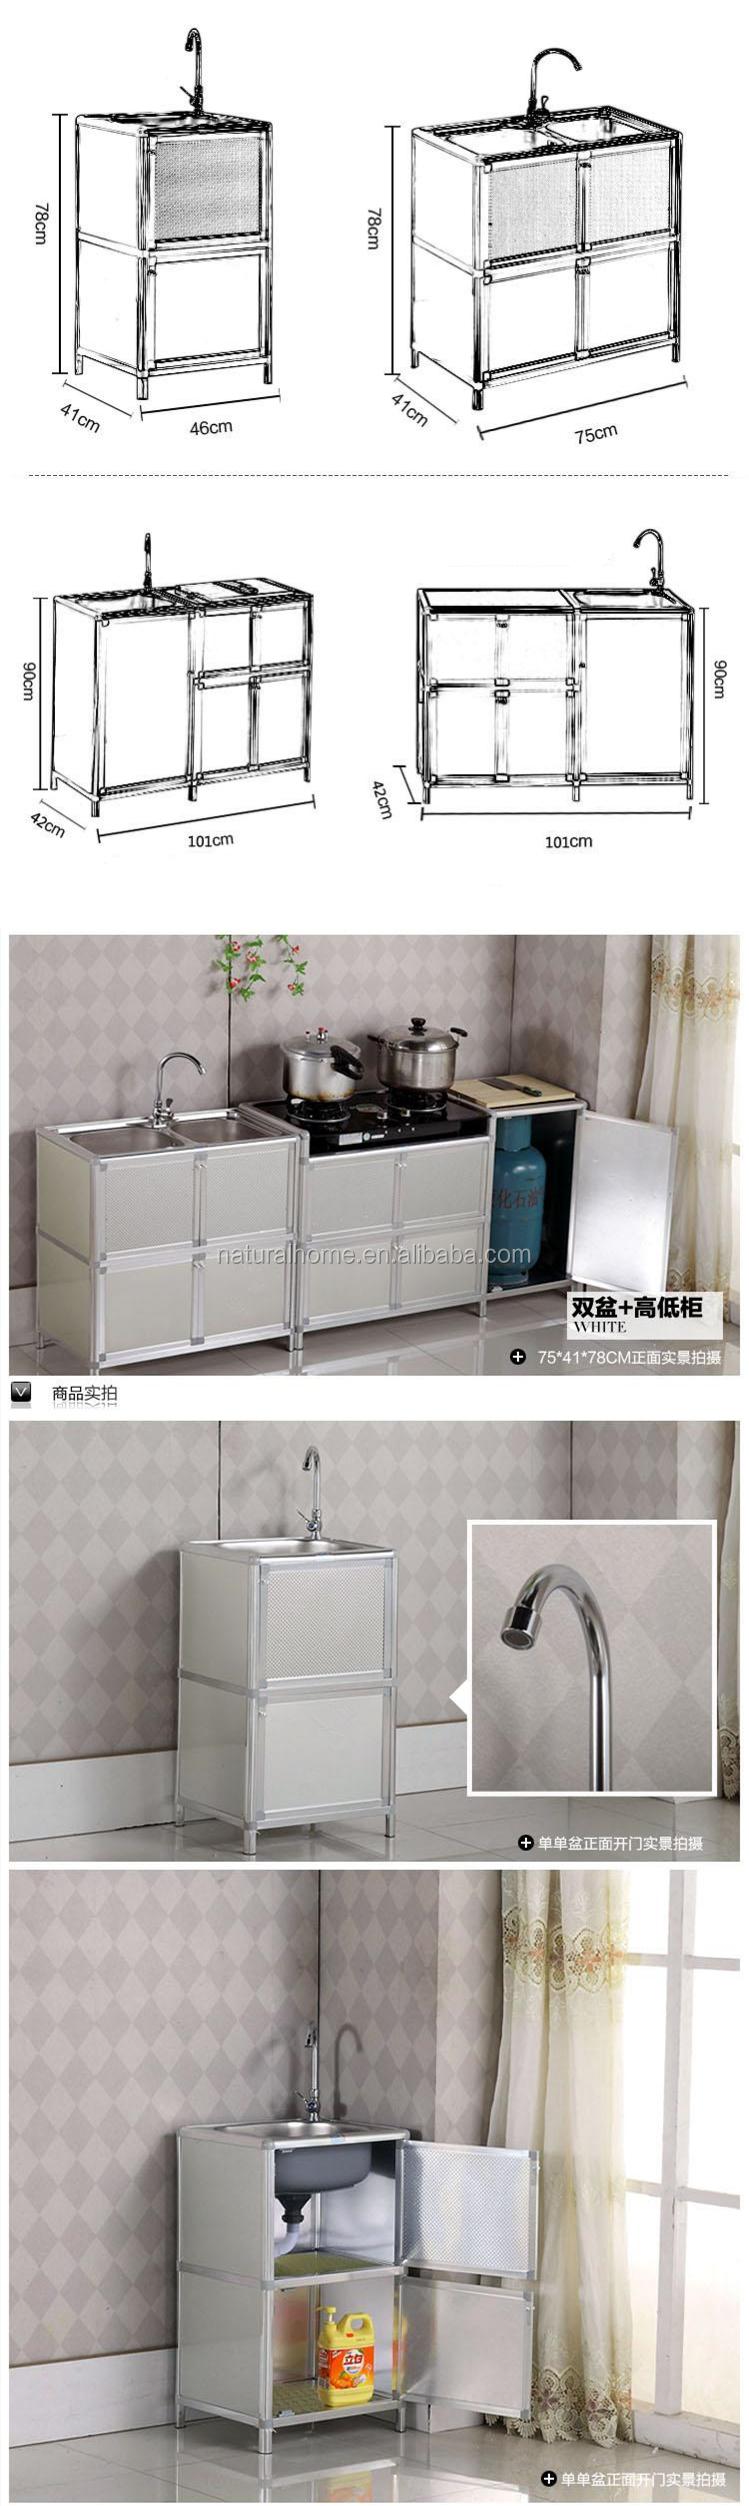 Aluminium Bathroom Cabinets Kitchen Furniture Outdoor Indoor Aluminium Cabinet With Stainless